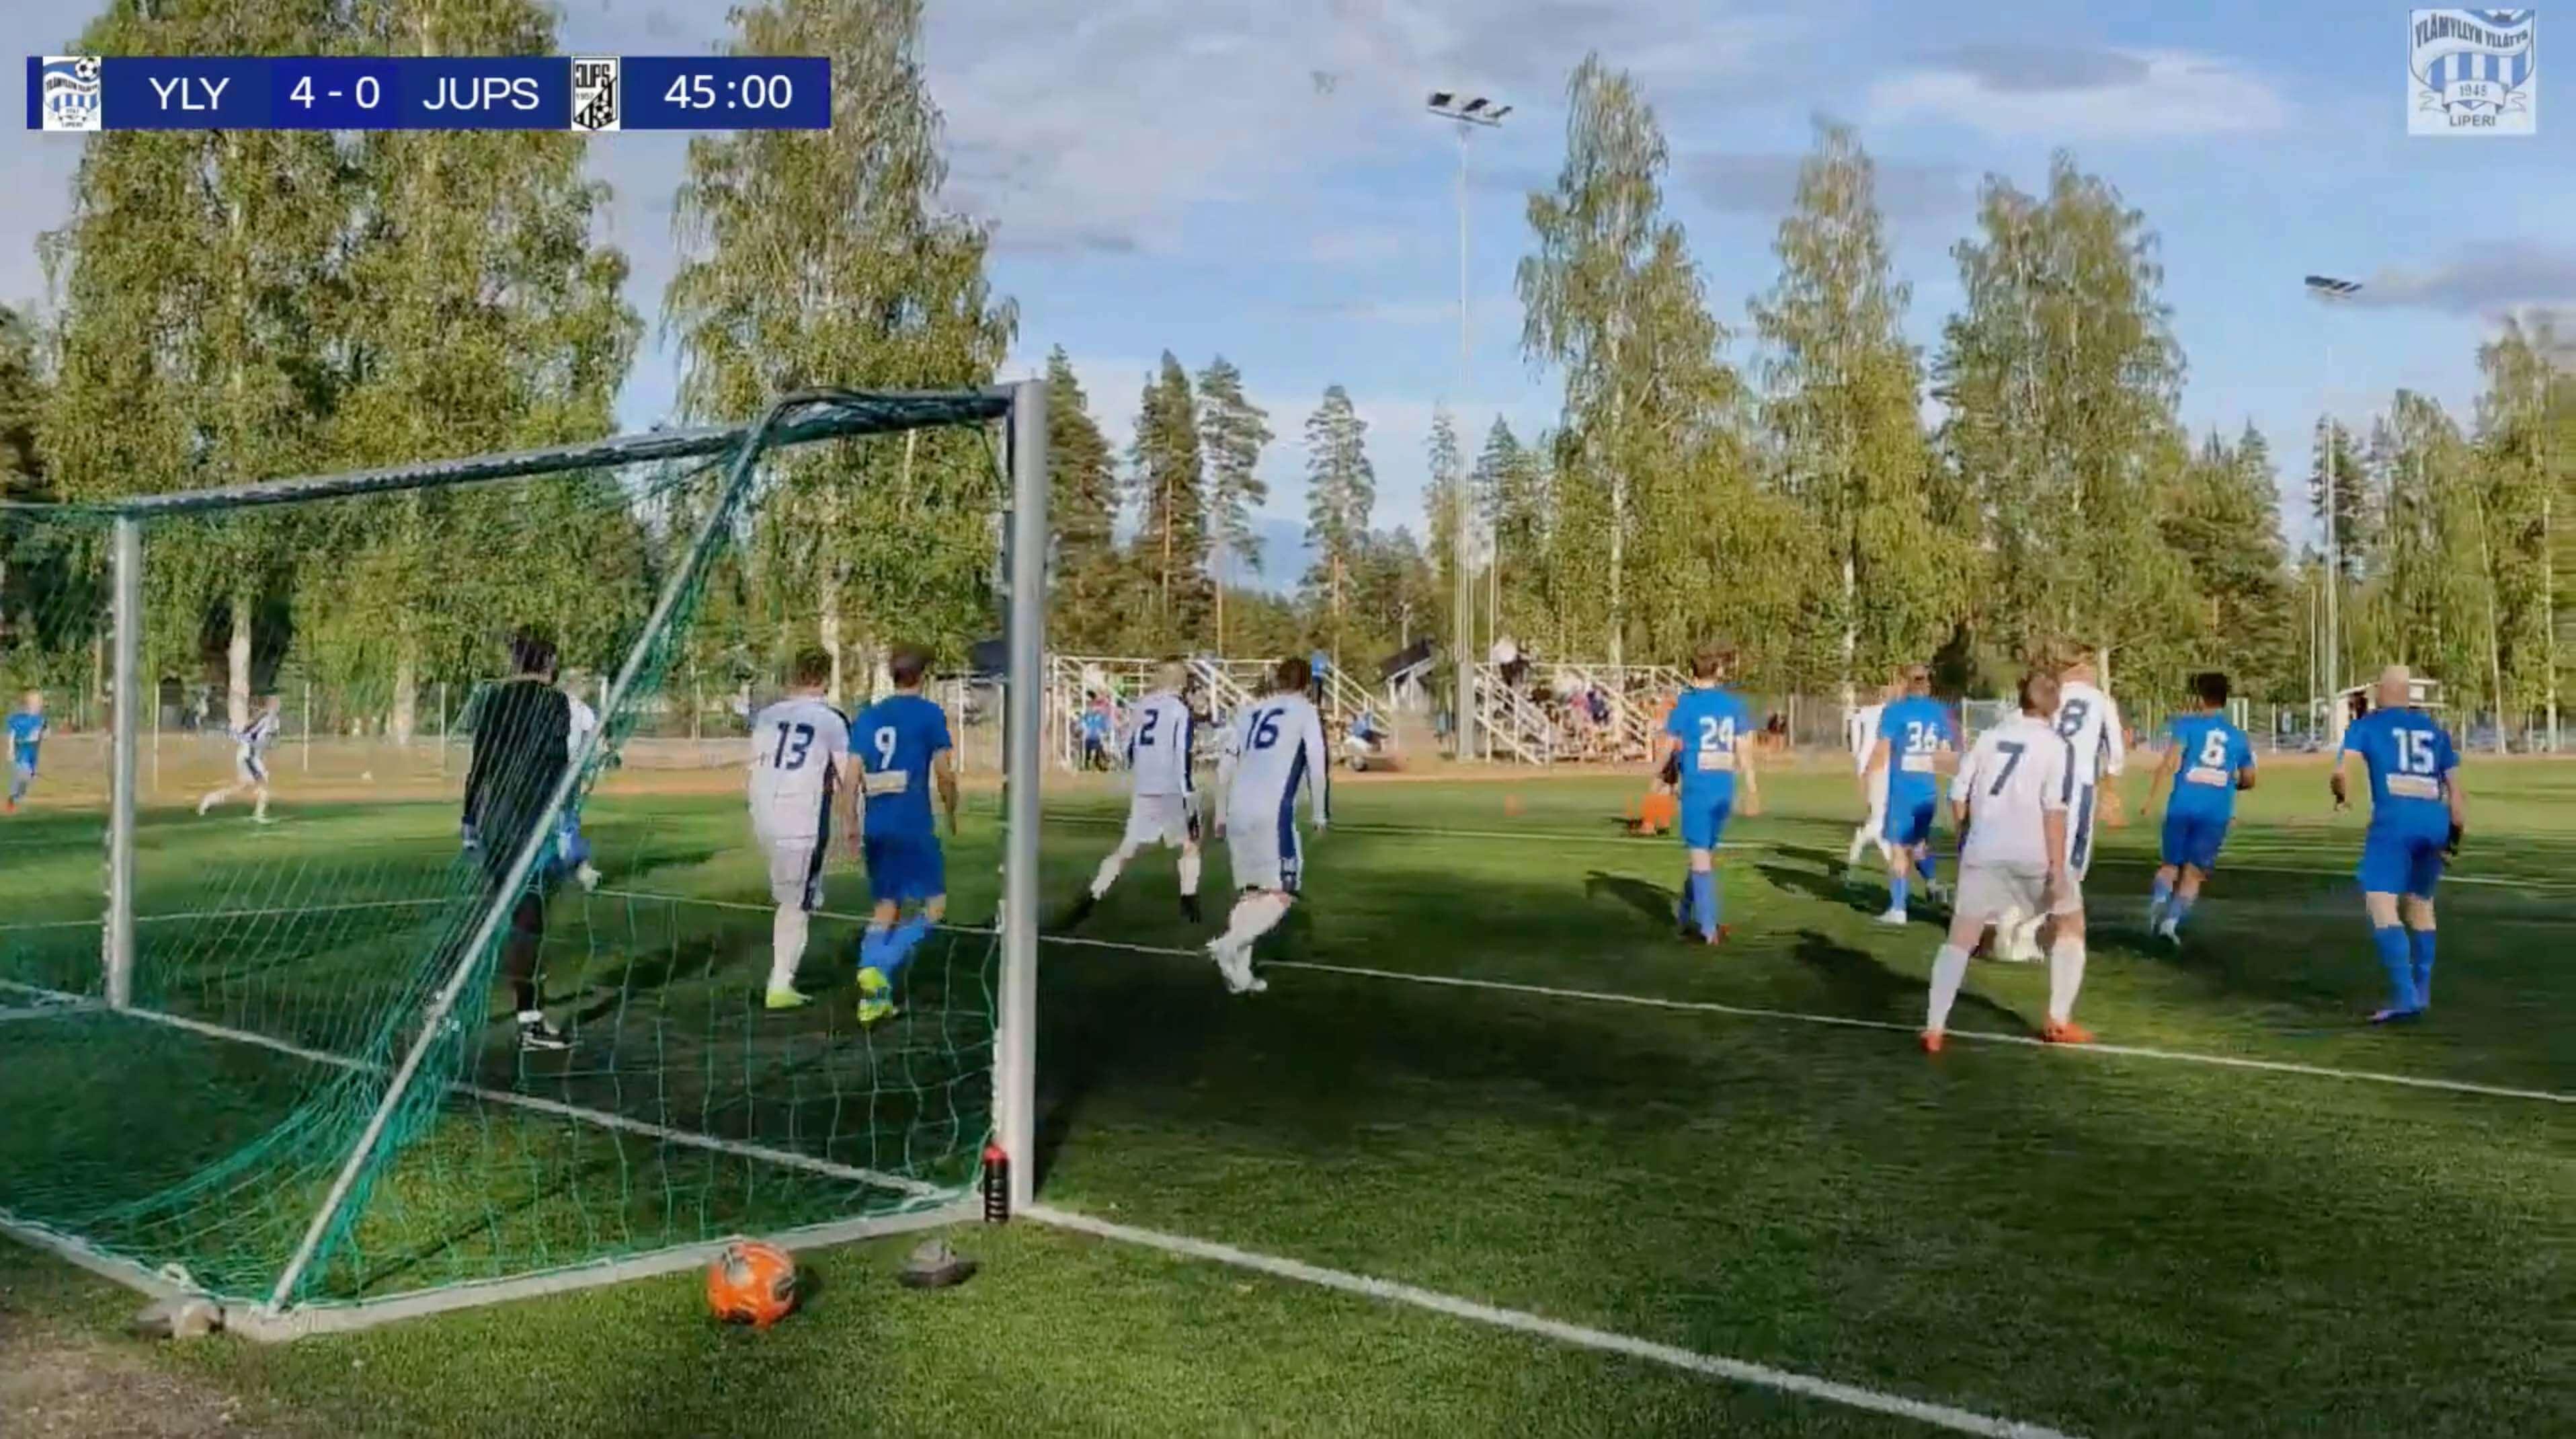 Finnish Soccer Club Ylämyllyn Yllätys Elevates Their Live Content